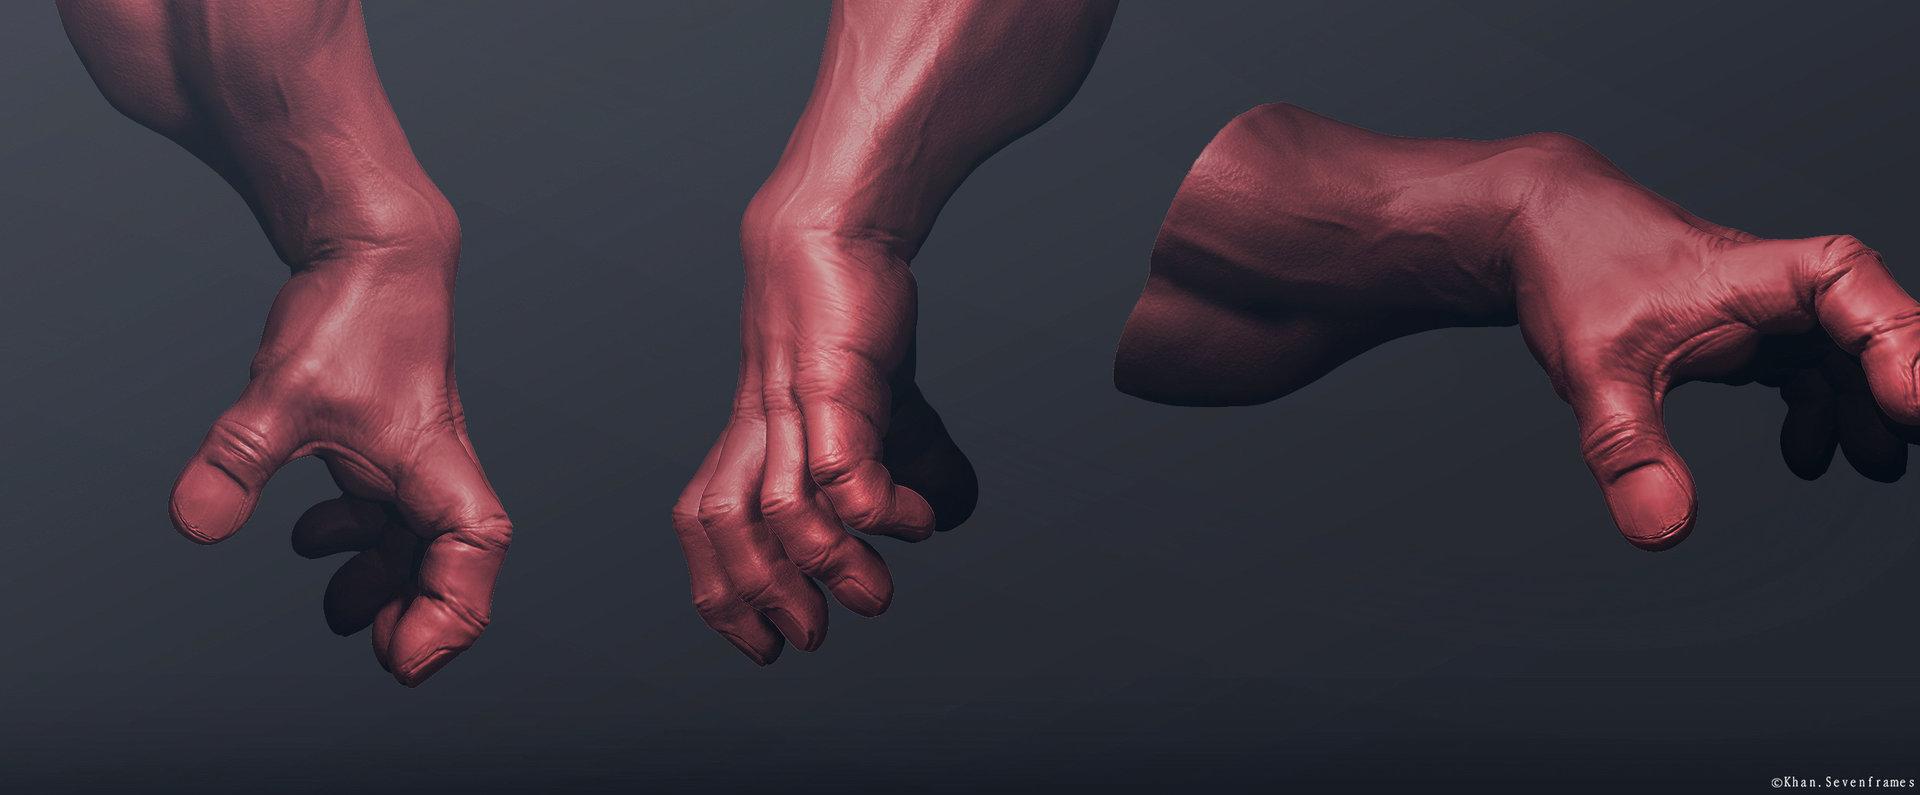 Khan SevenFrames Hulk Hands Inspired by Andy Bergholtz